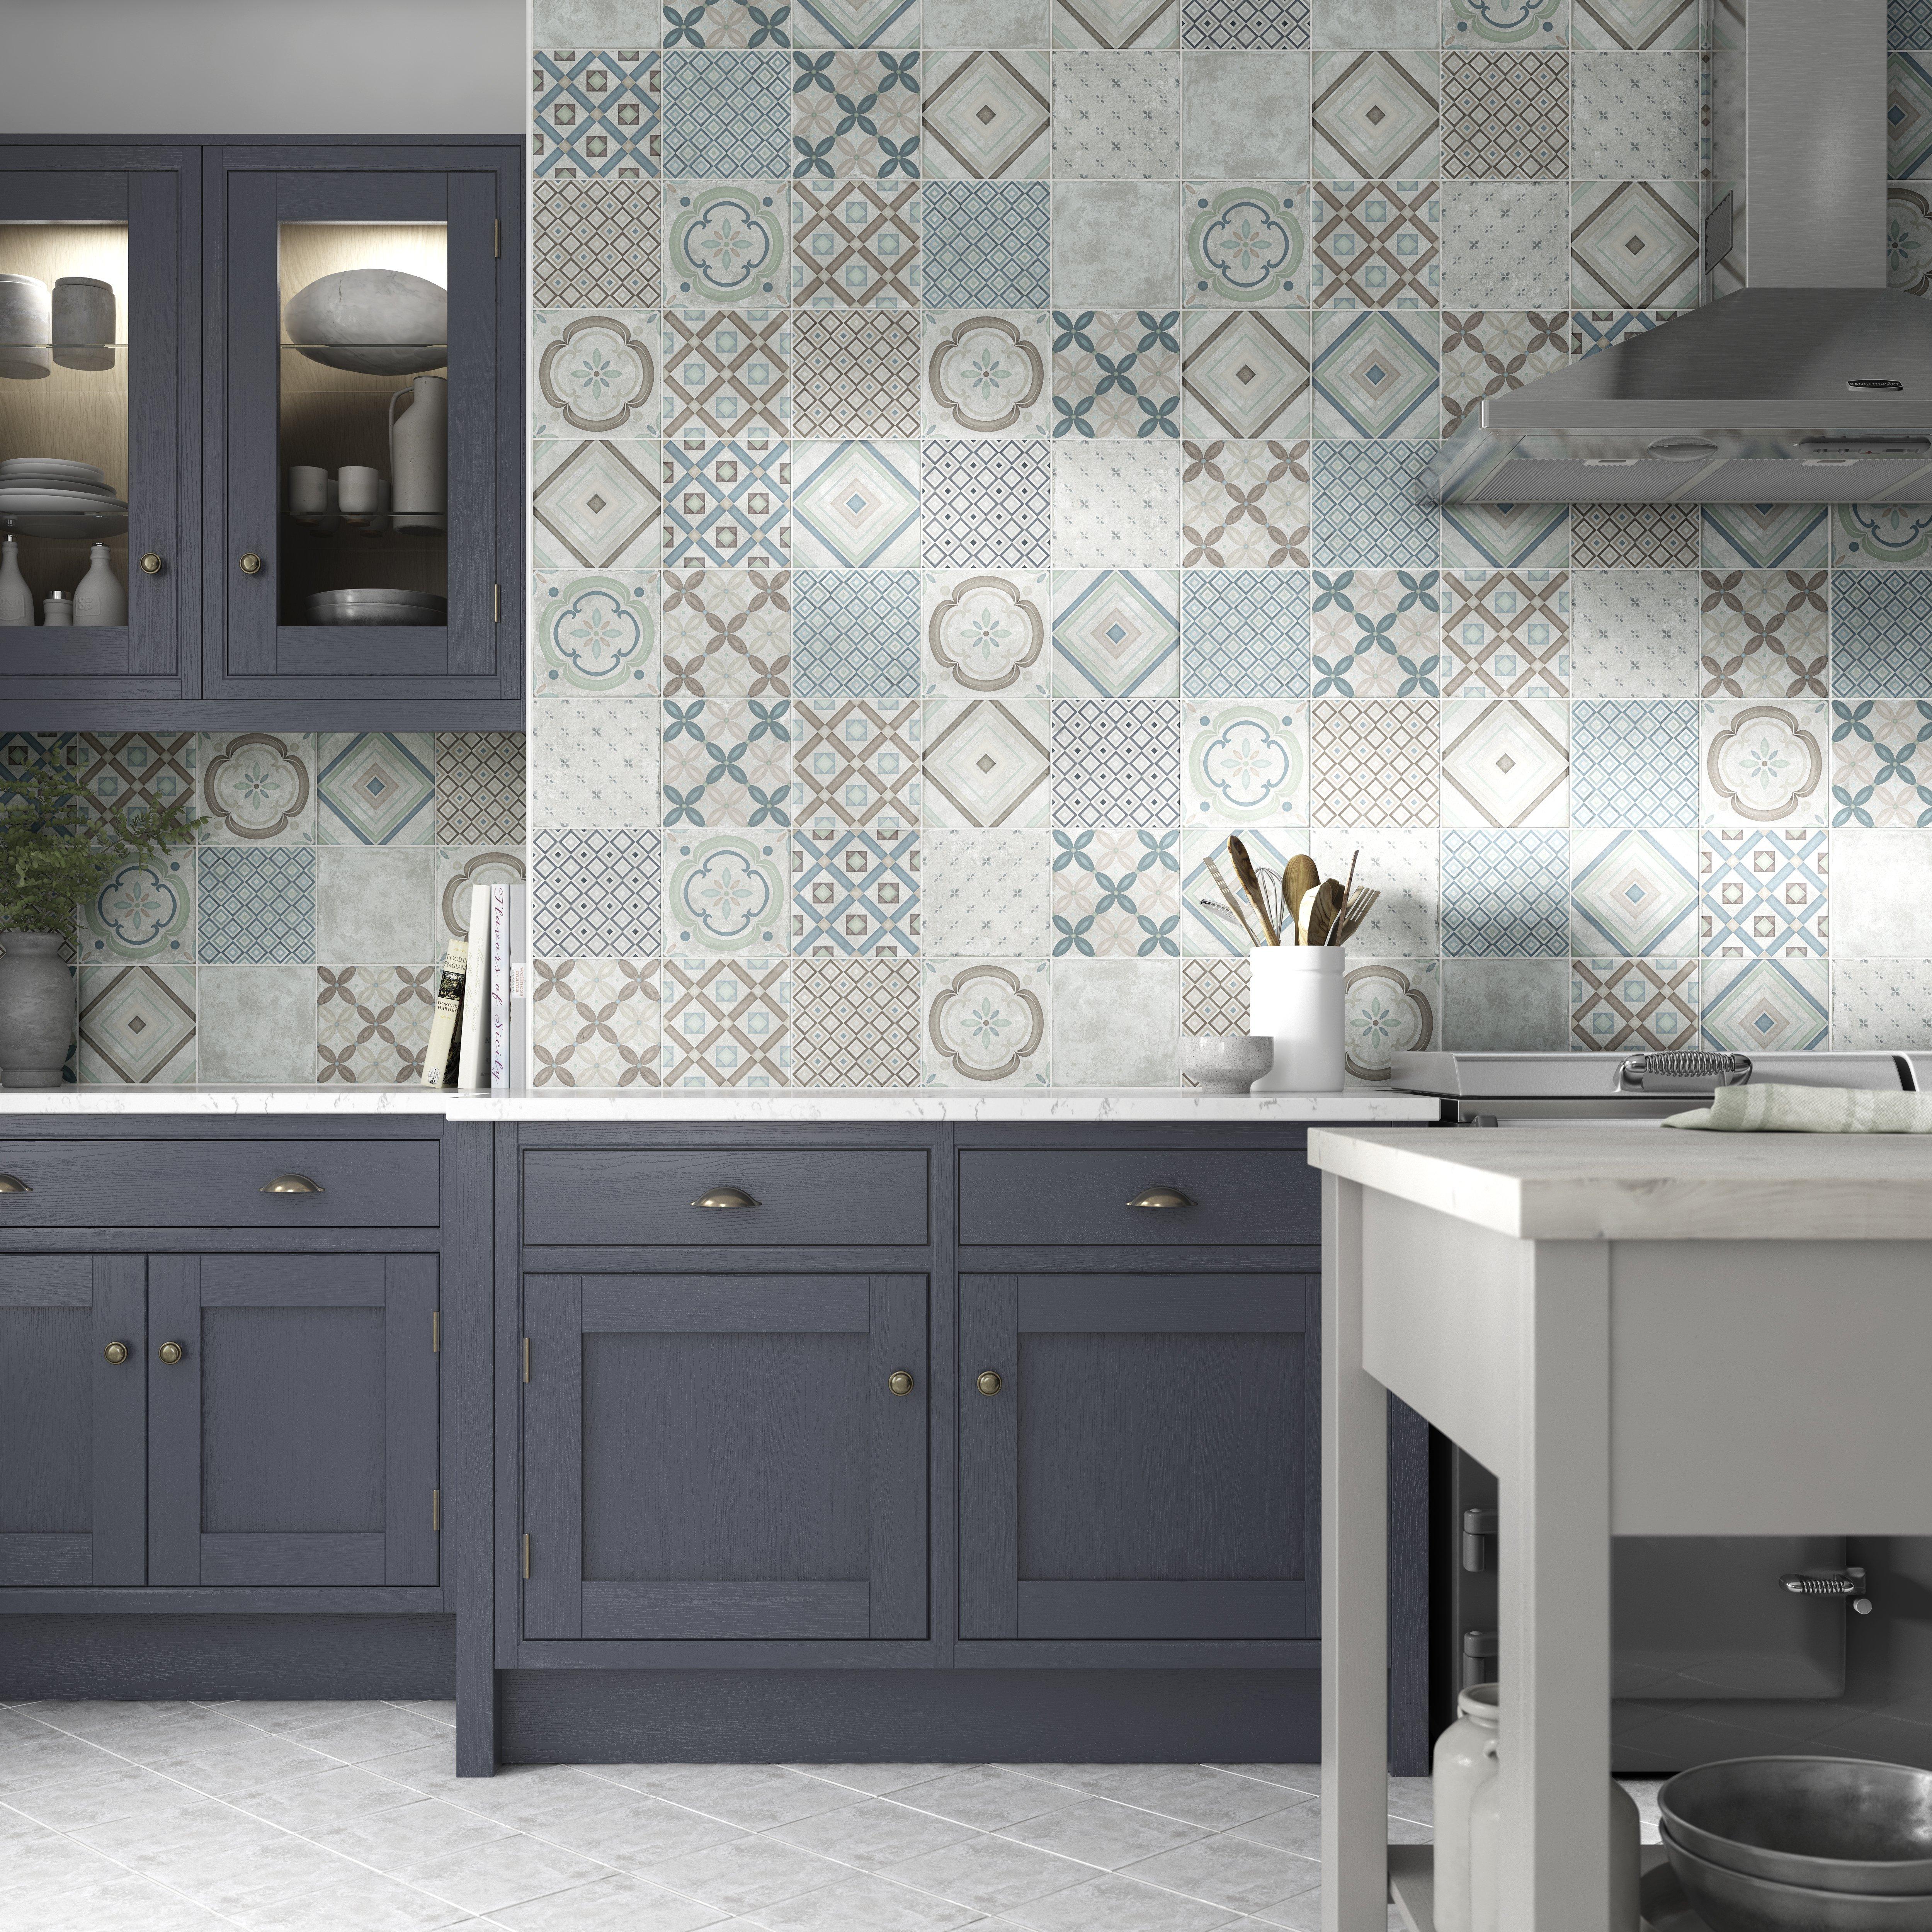 johnson kitchen wall tiles design – ksa g.com